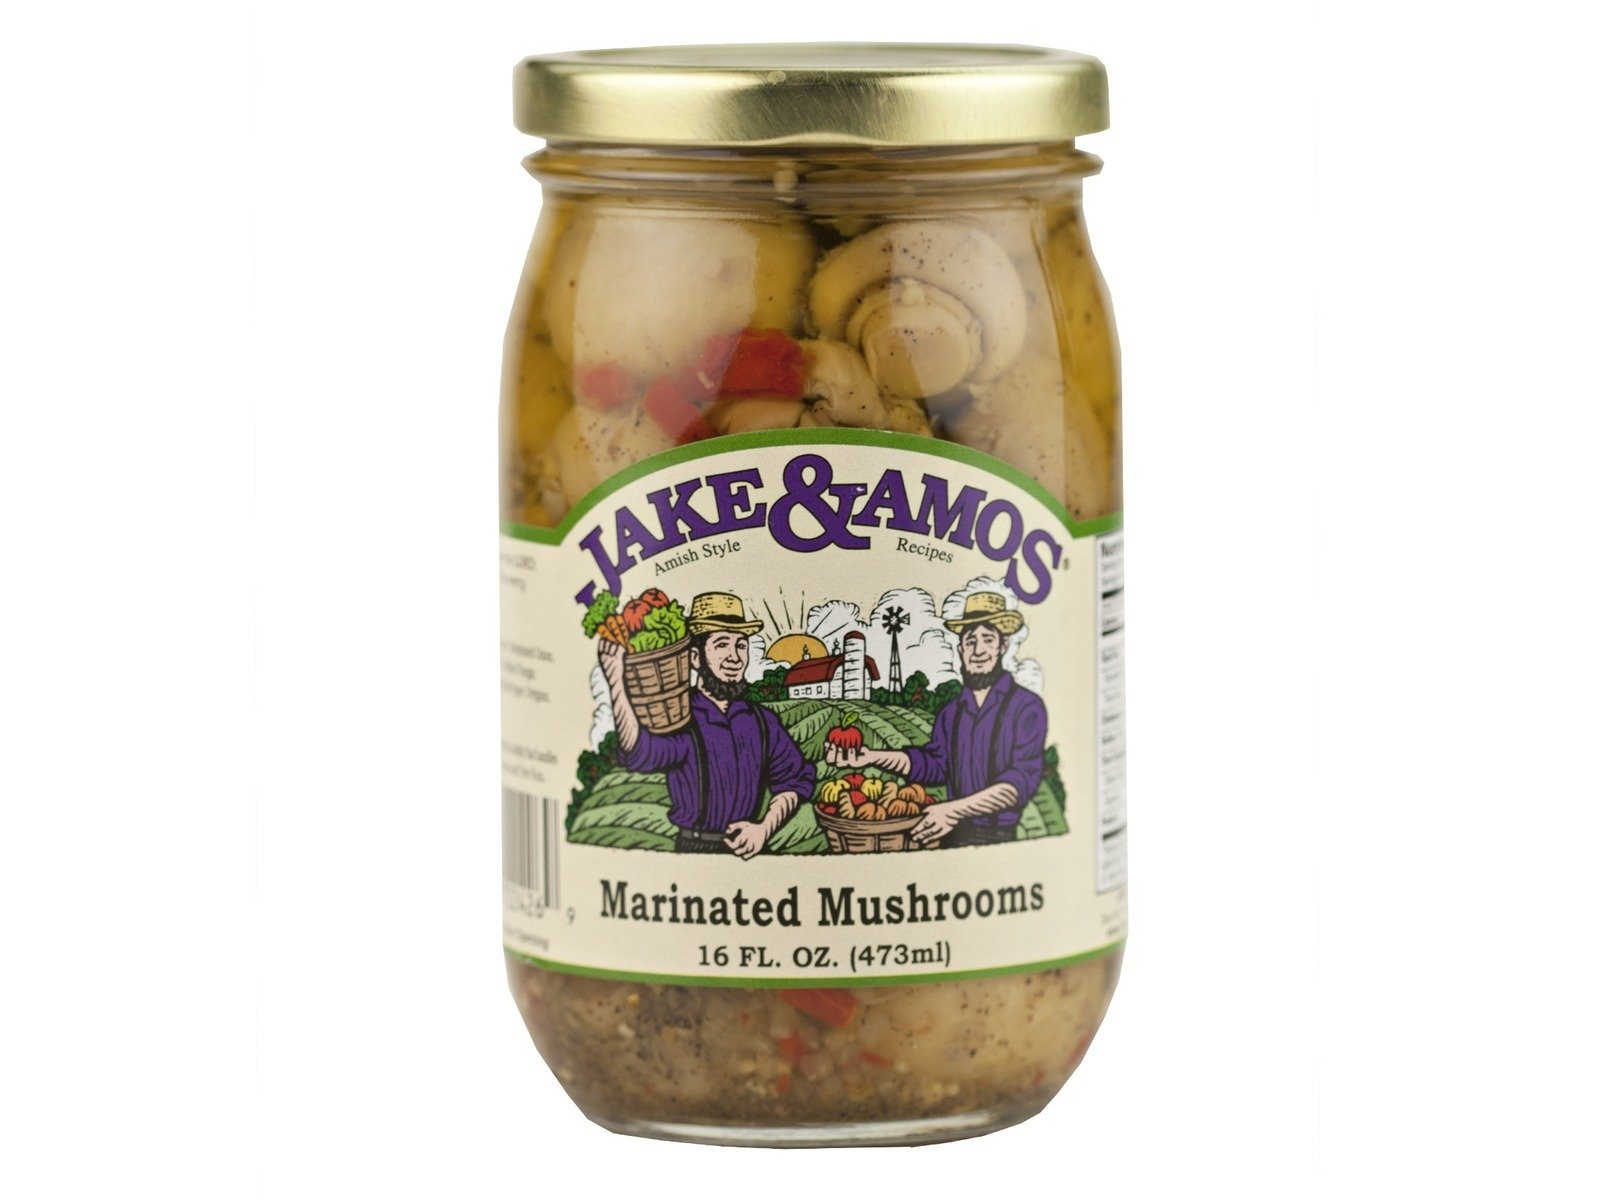 Jake & Amos Marinated Mushrooms, 16 Ounce - 3 Pack by Jake & Amos